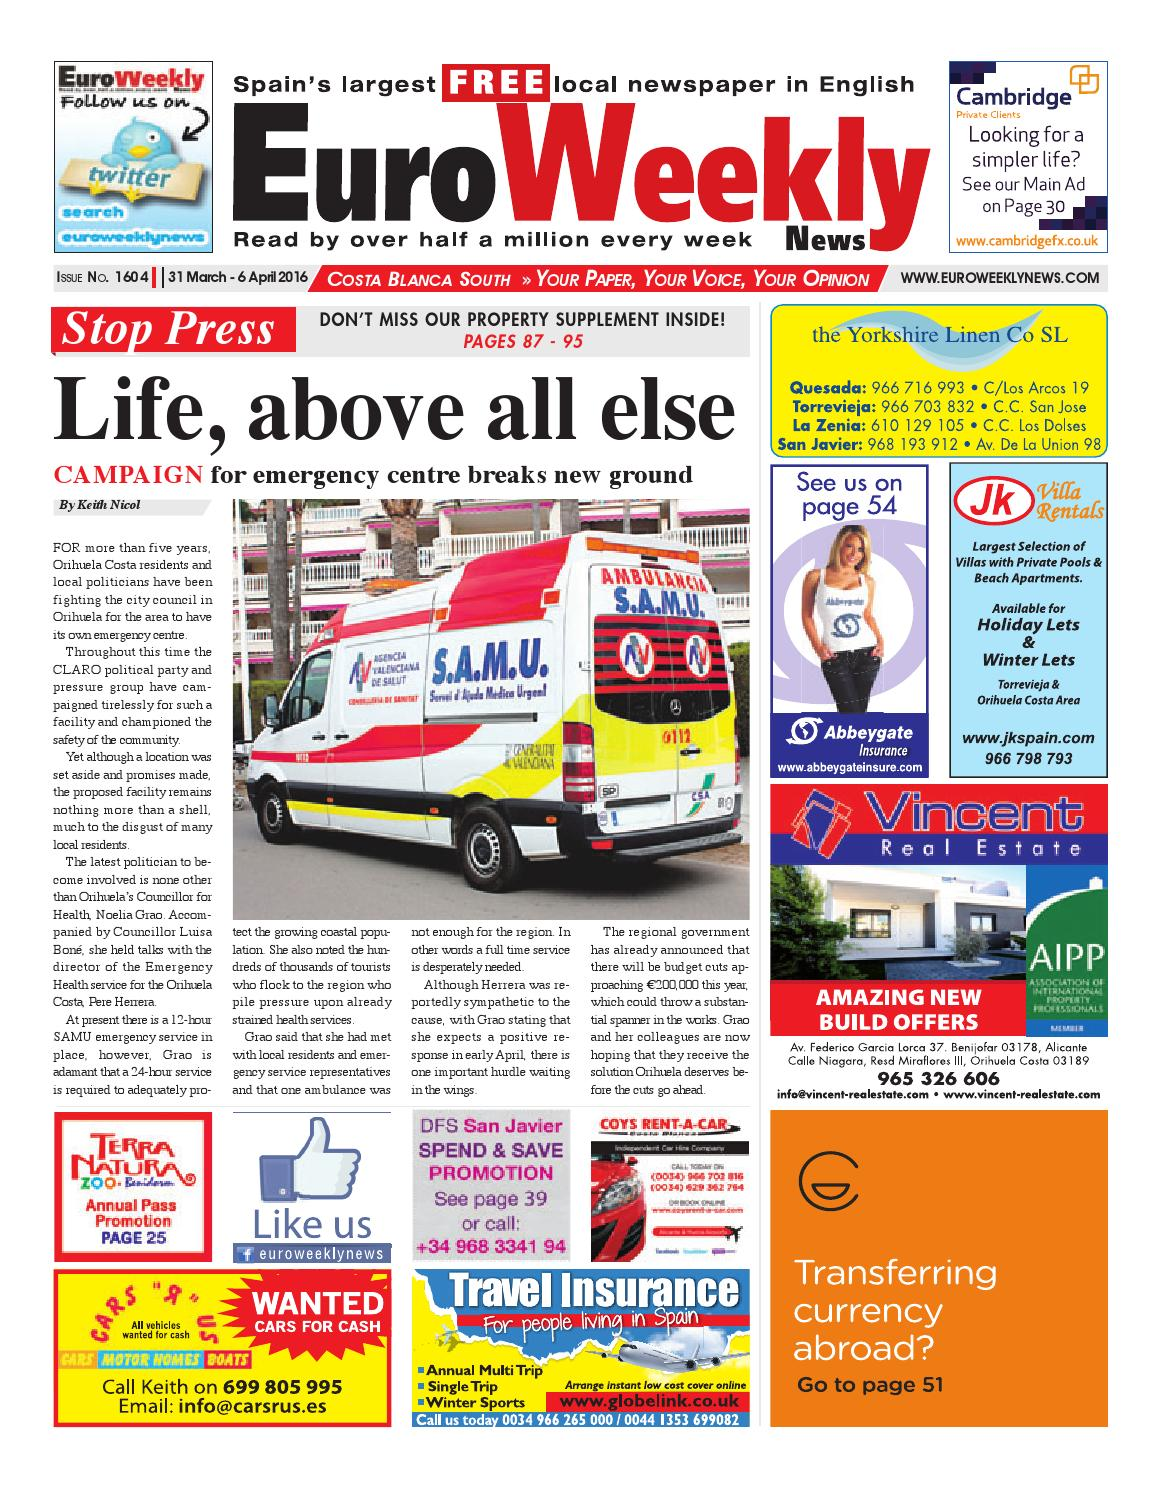 sofaland spain 7 seater sofa cover set euro weekly news costa blanca south 9 issuu autos post